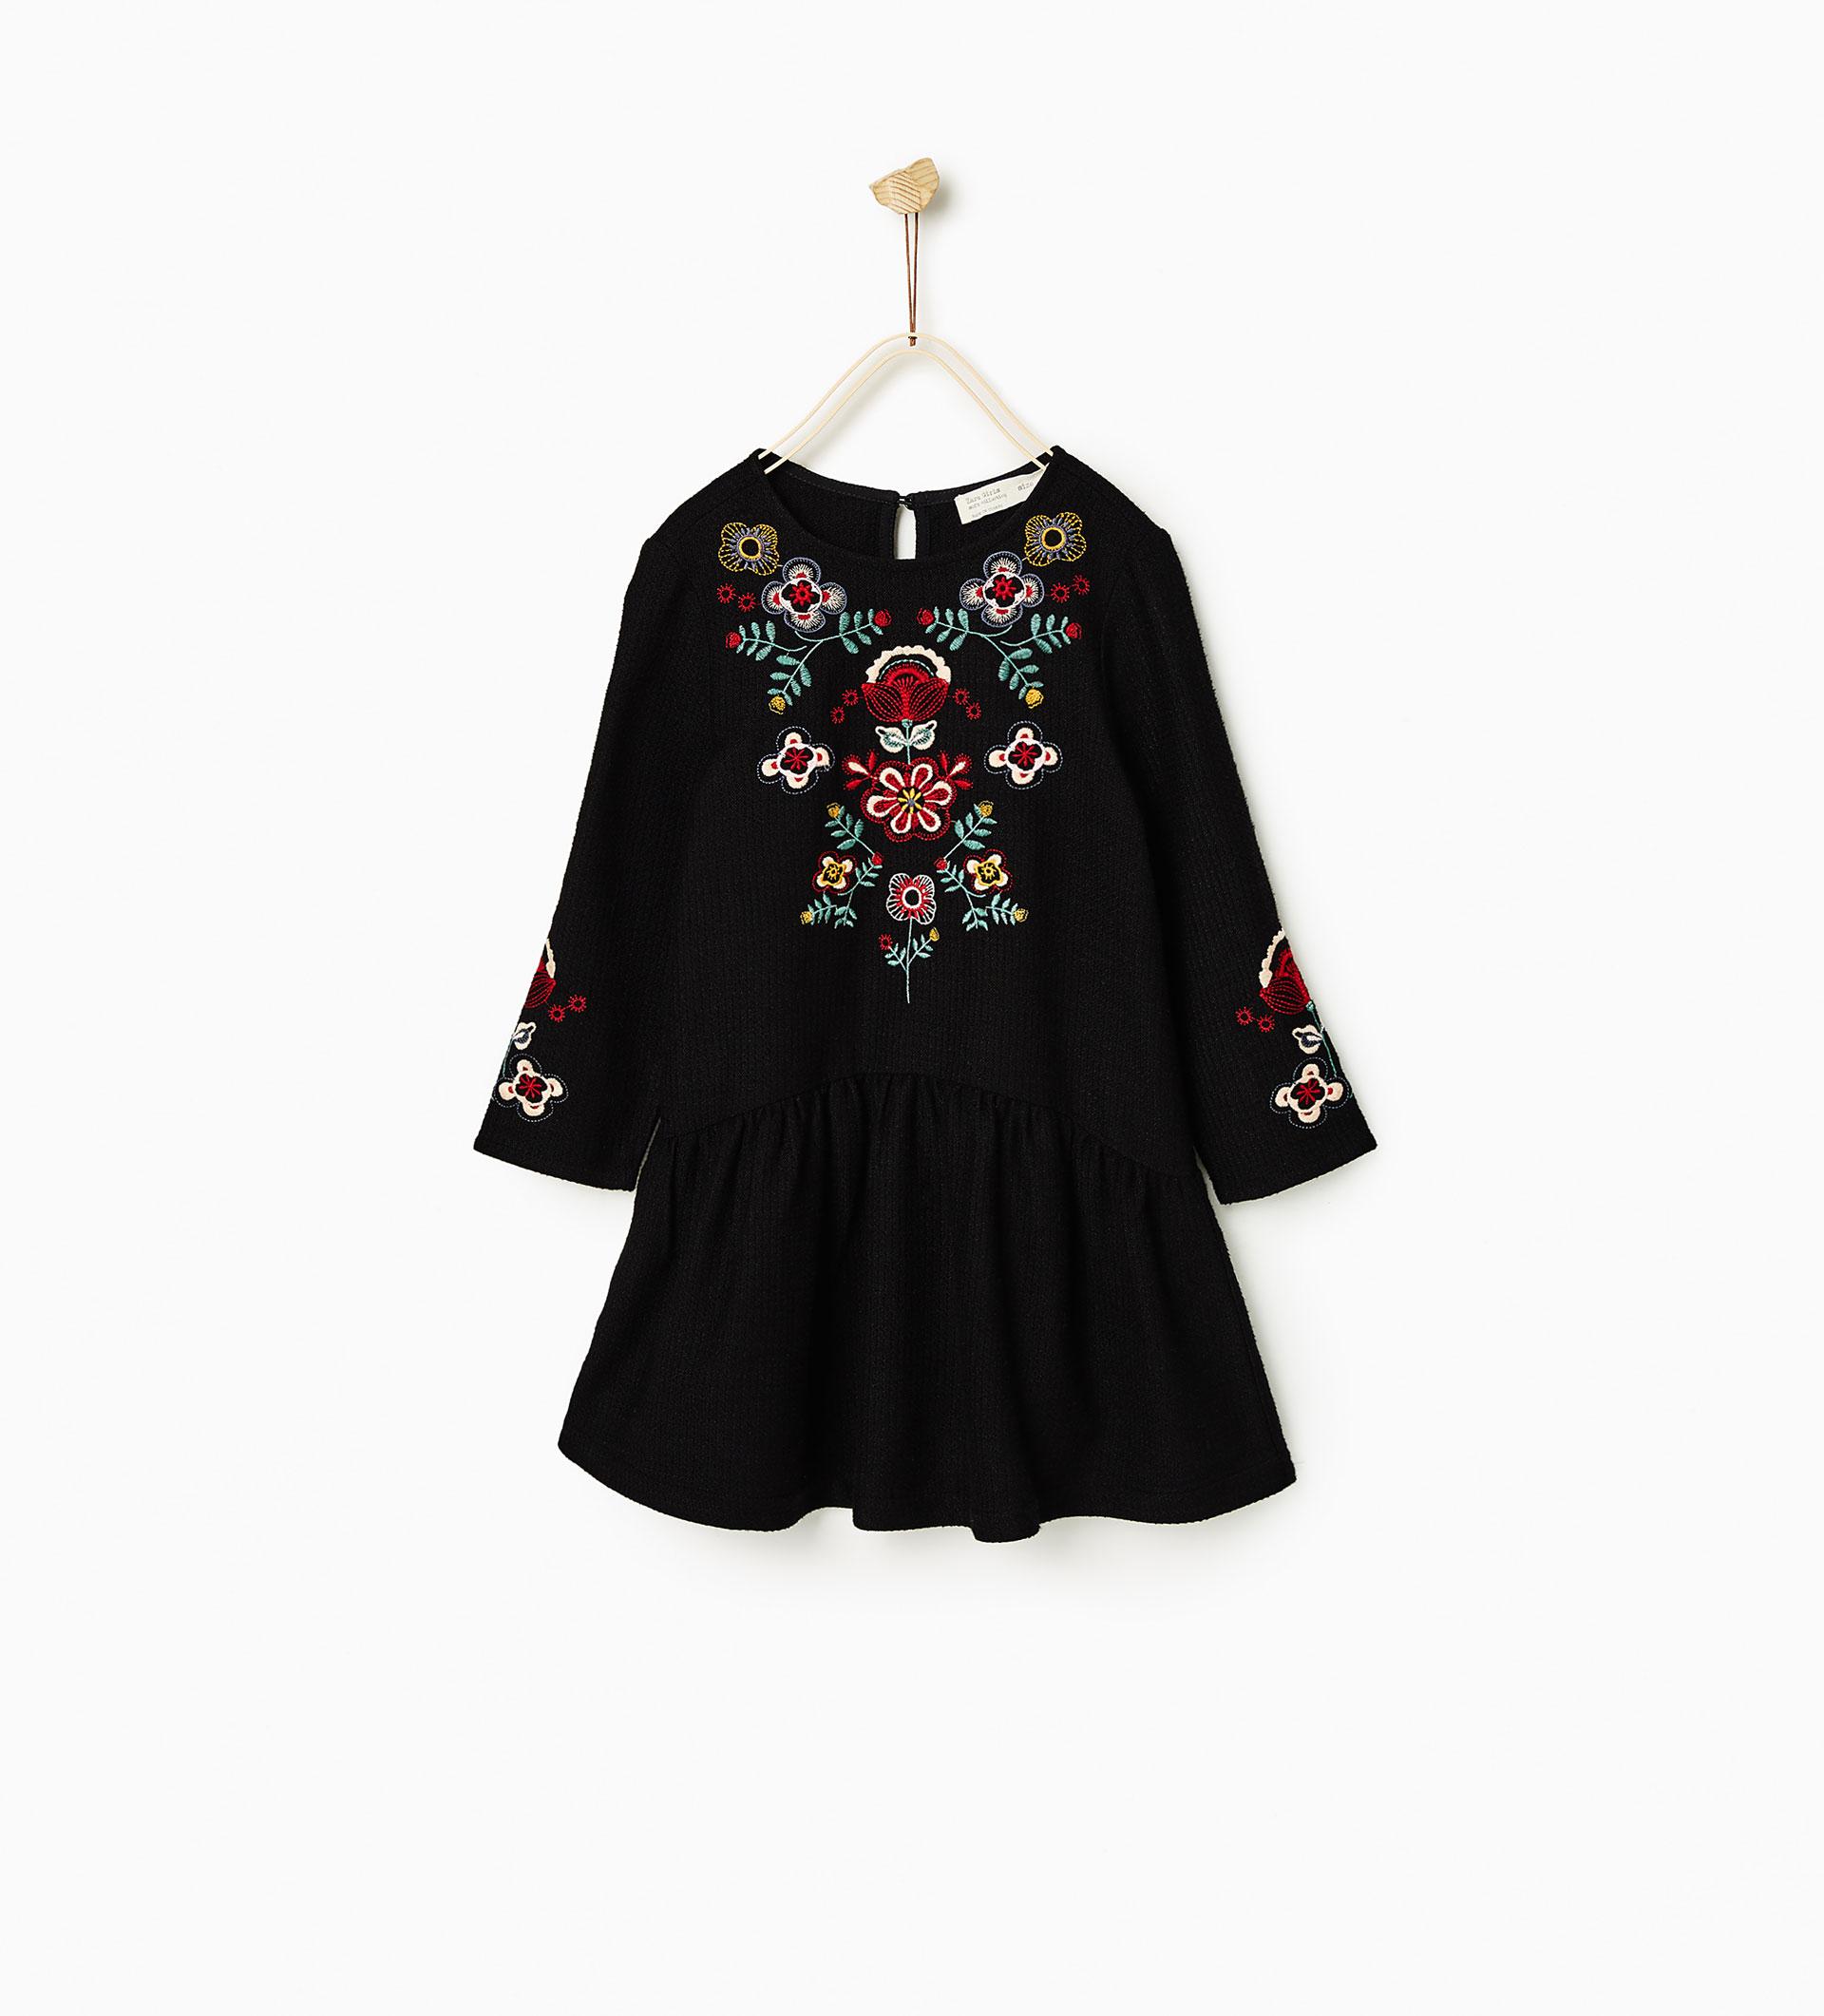 Sayuri Villalba - Zara Kids Embroidery Flowers1